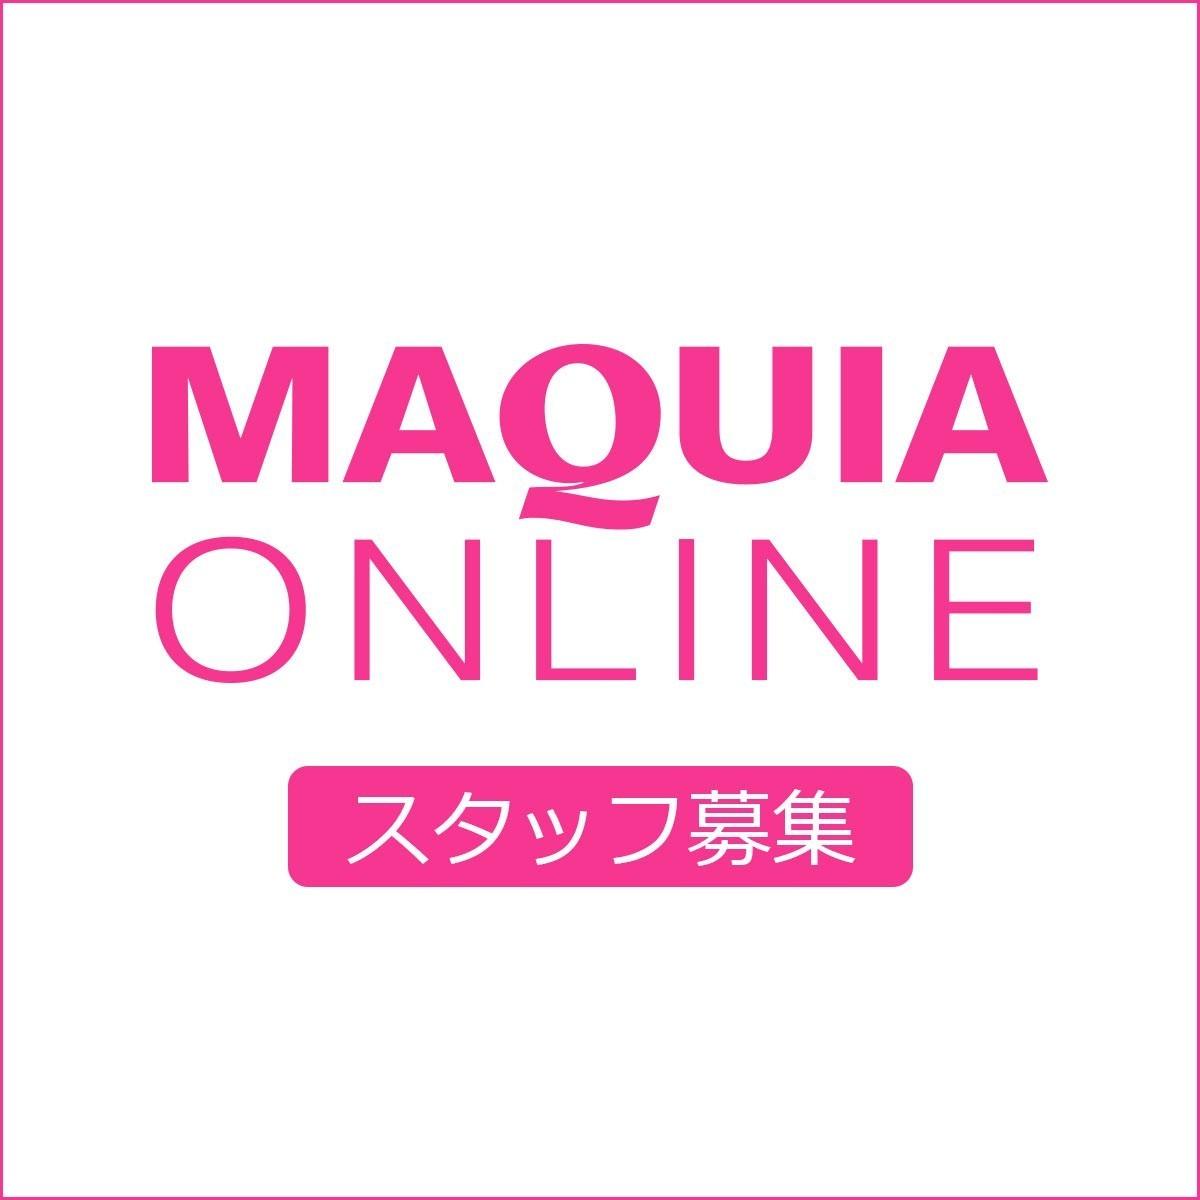 MAQUIA ONLINE ウェブスタッフ(業務委託)を募集!